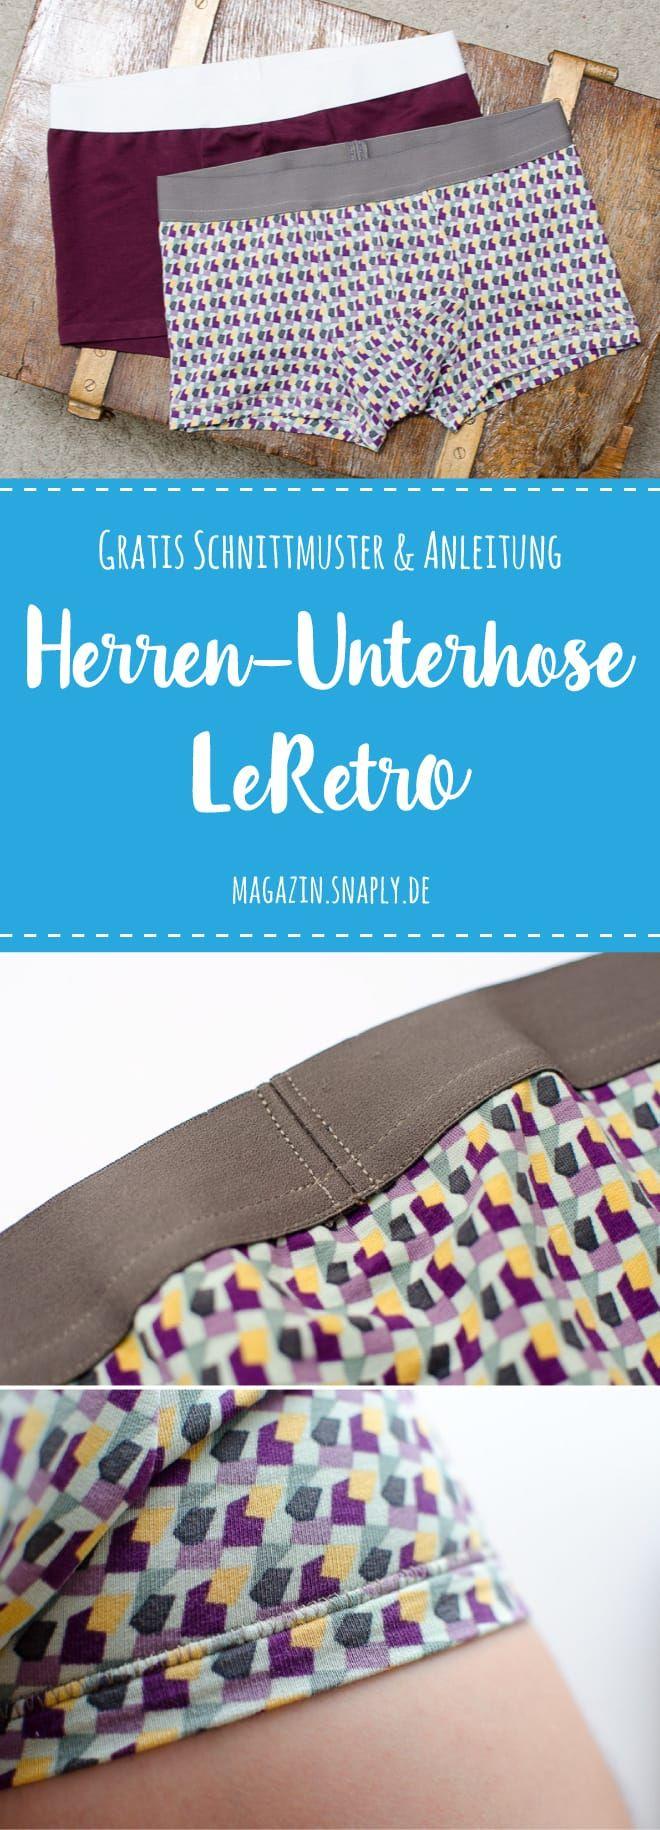 "Kostenloses Schnittmuster: Herren-Unterhose ""LeRetro"""